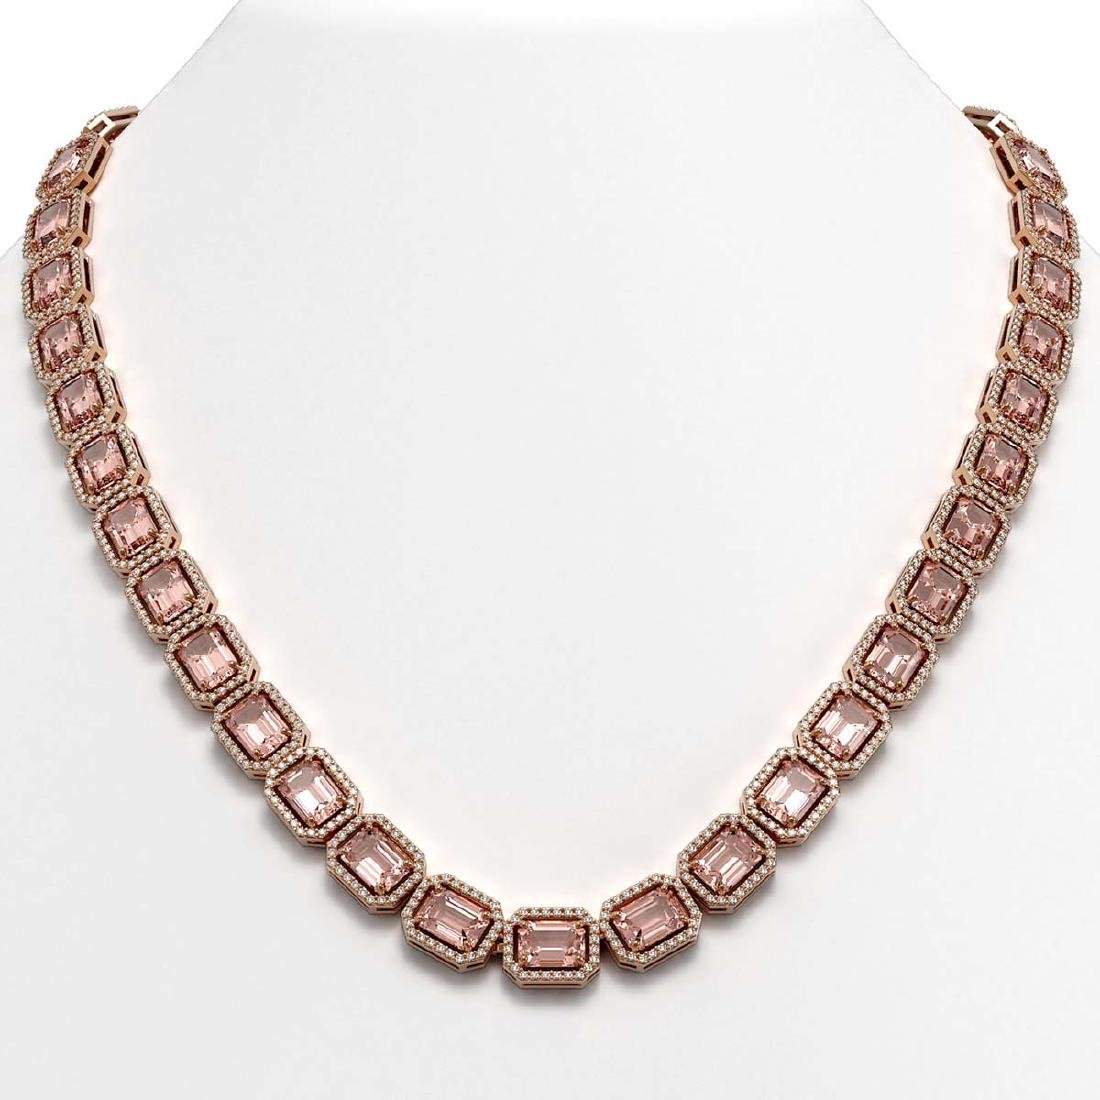 50.99 CTW Morganite & Diamond Halo Necklace 10K Rose